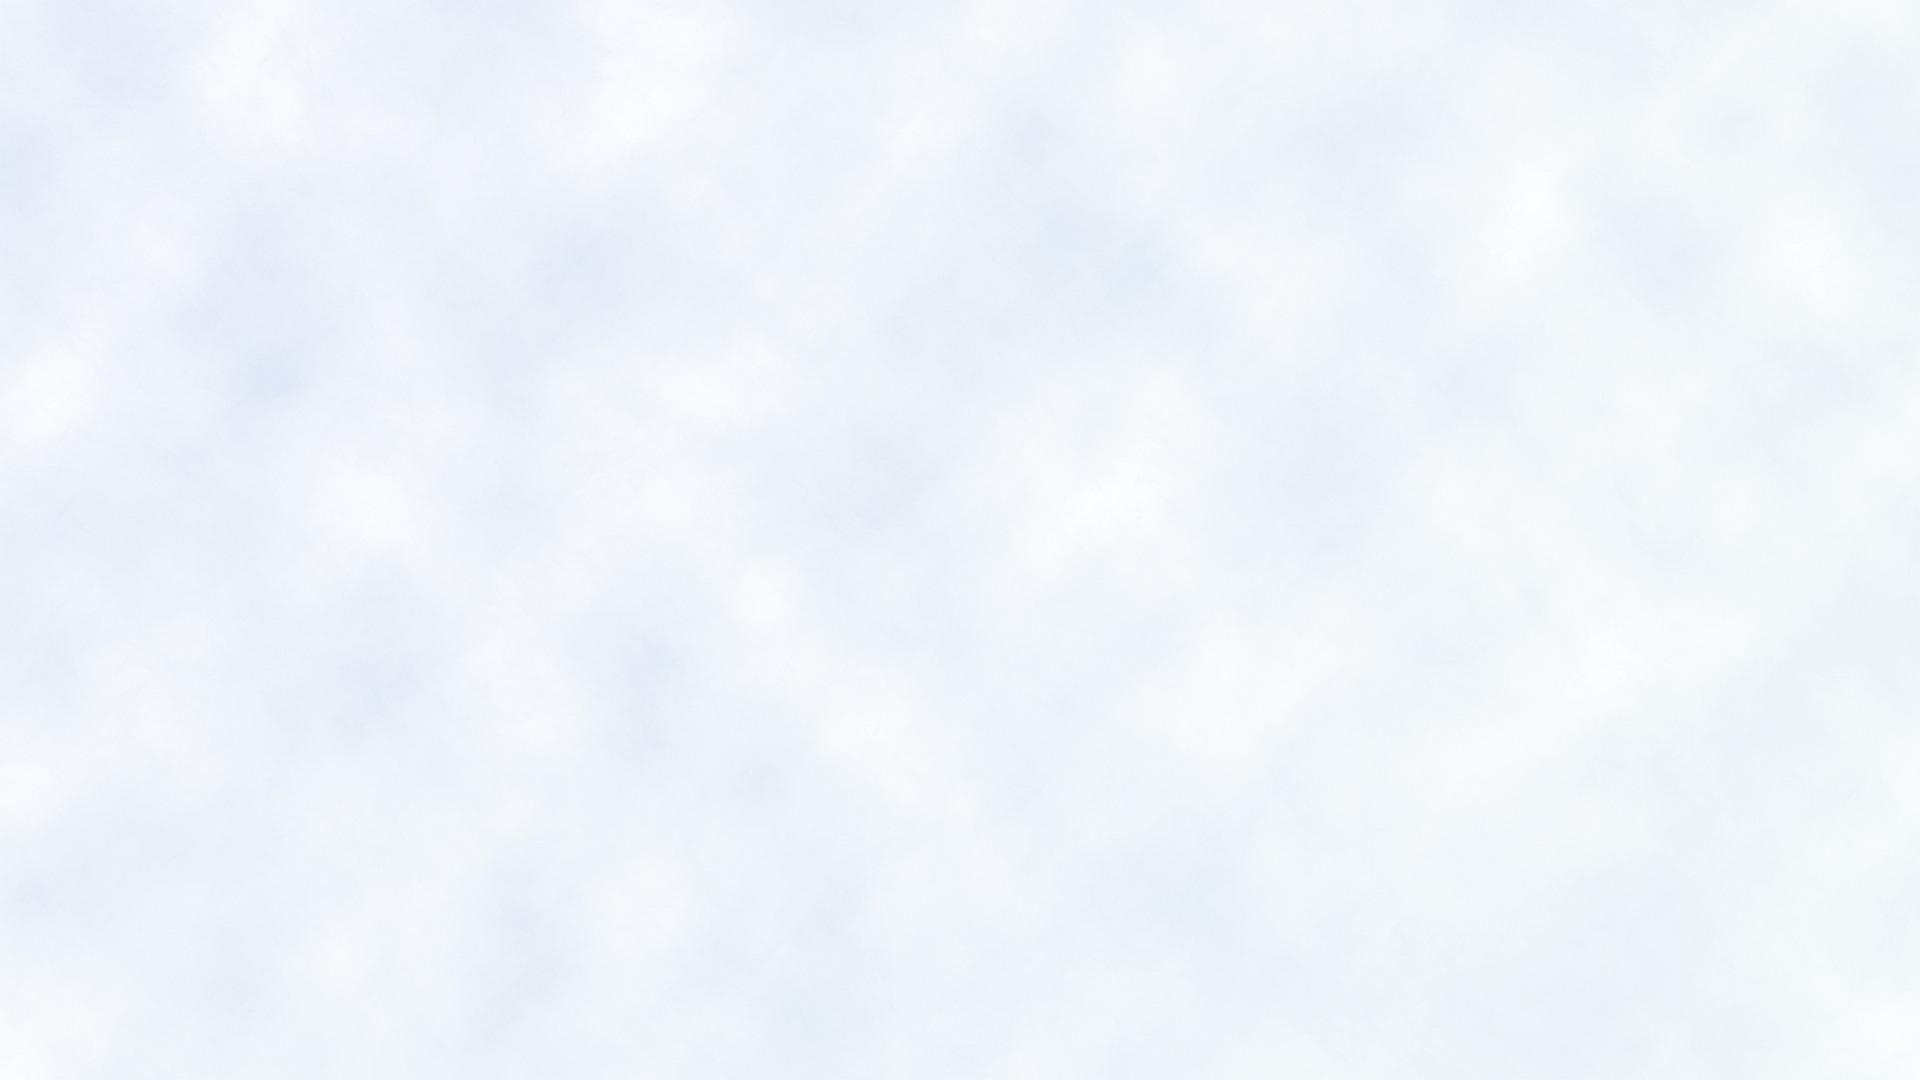 和紙風 壁紙背景画像_washi2